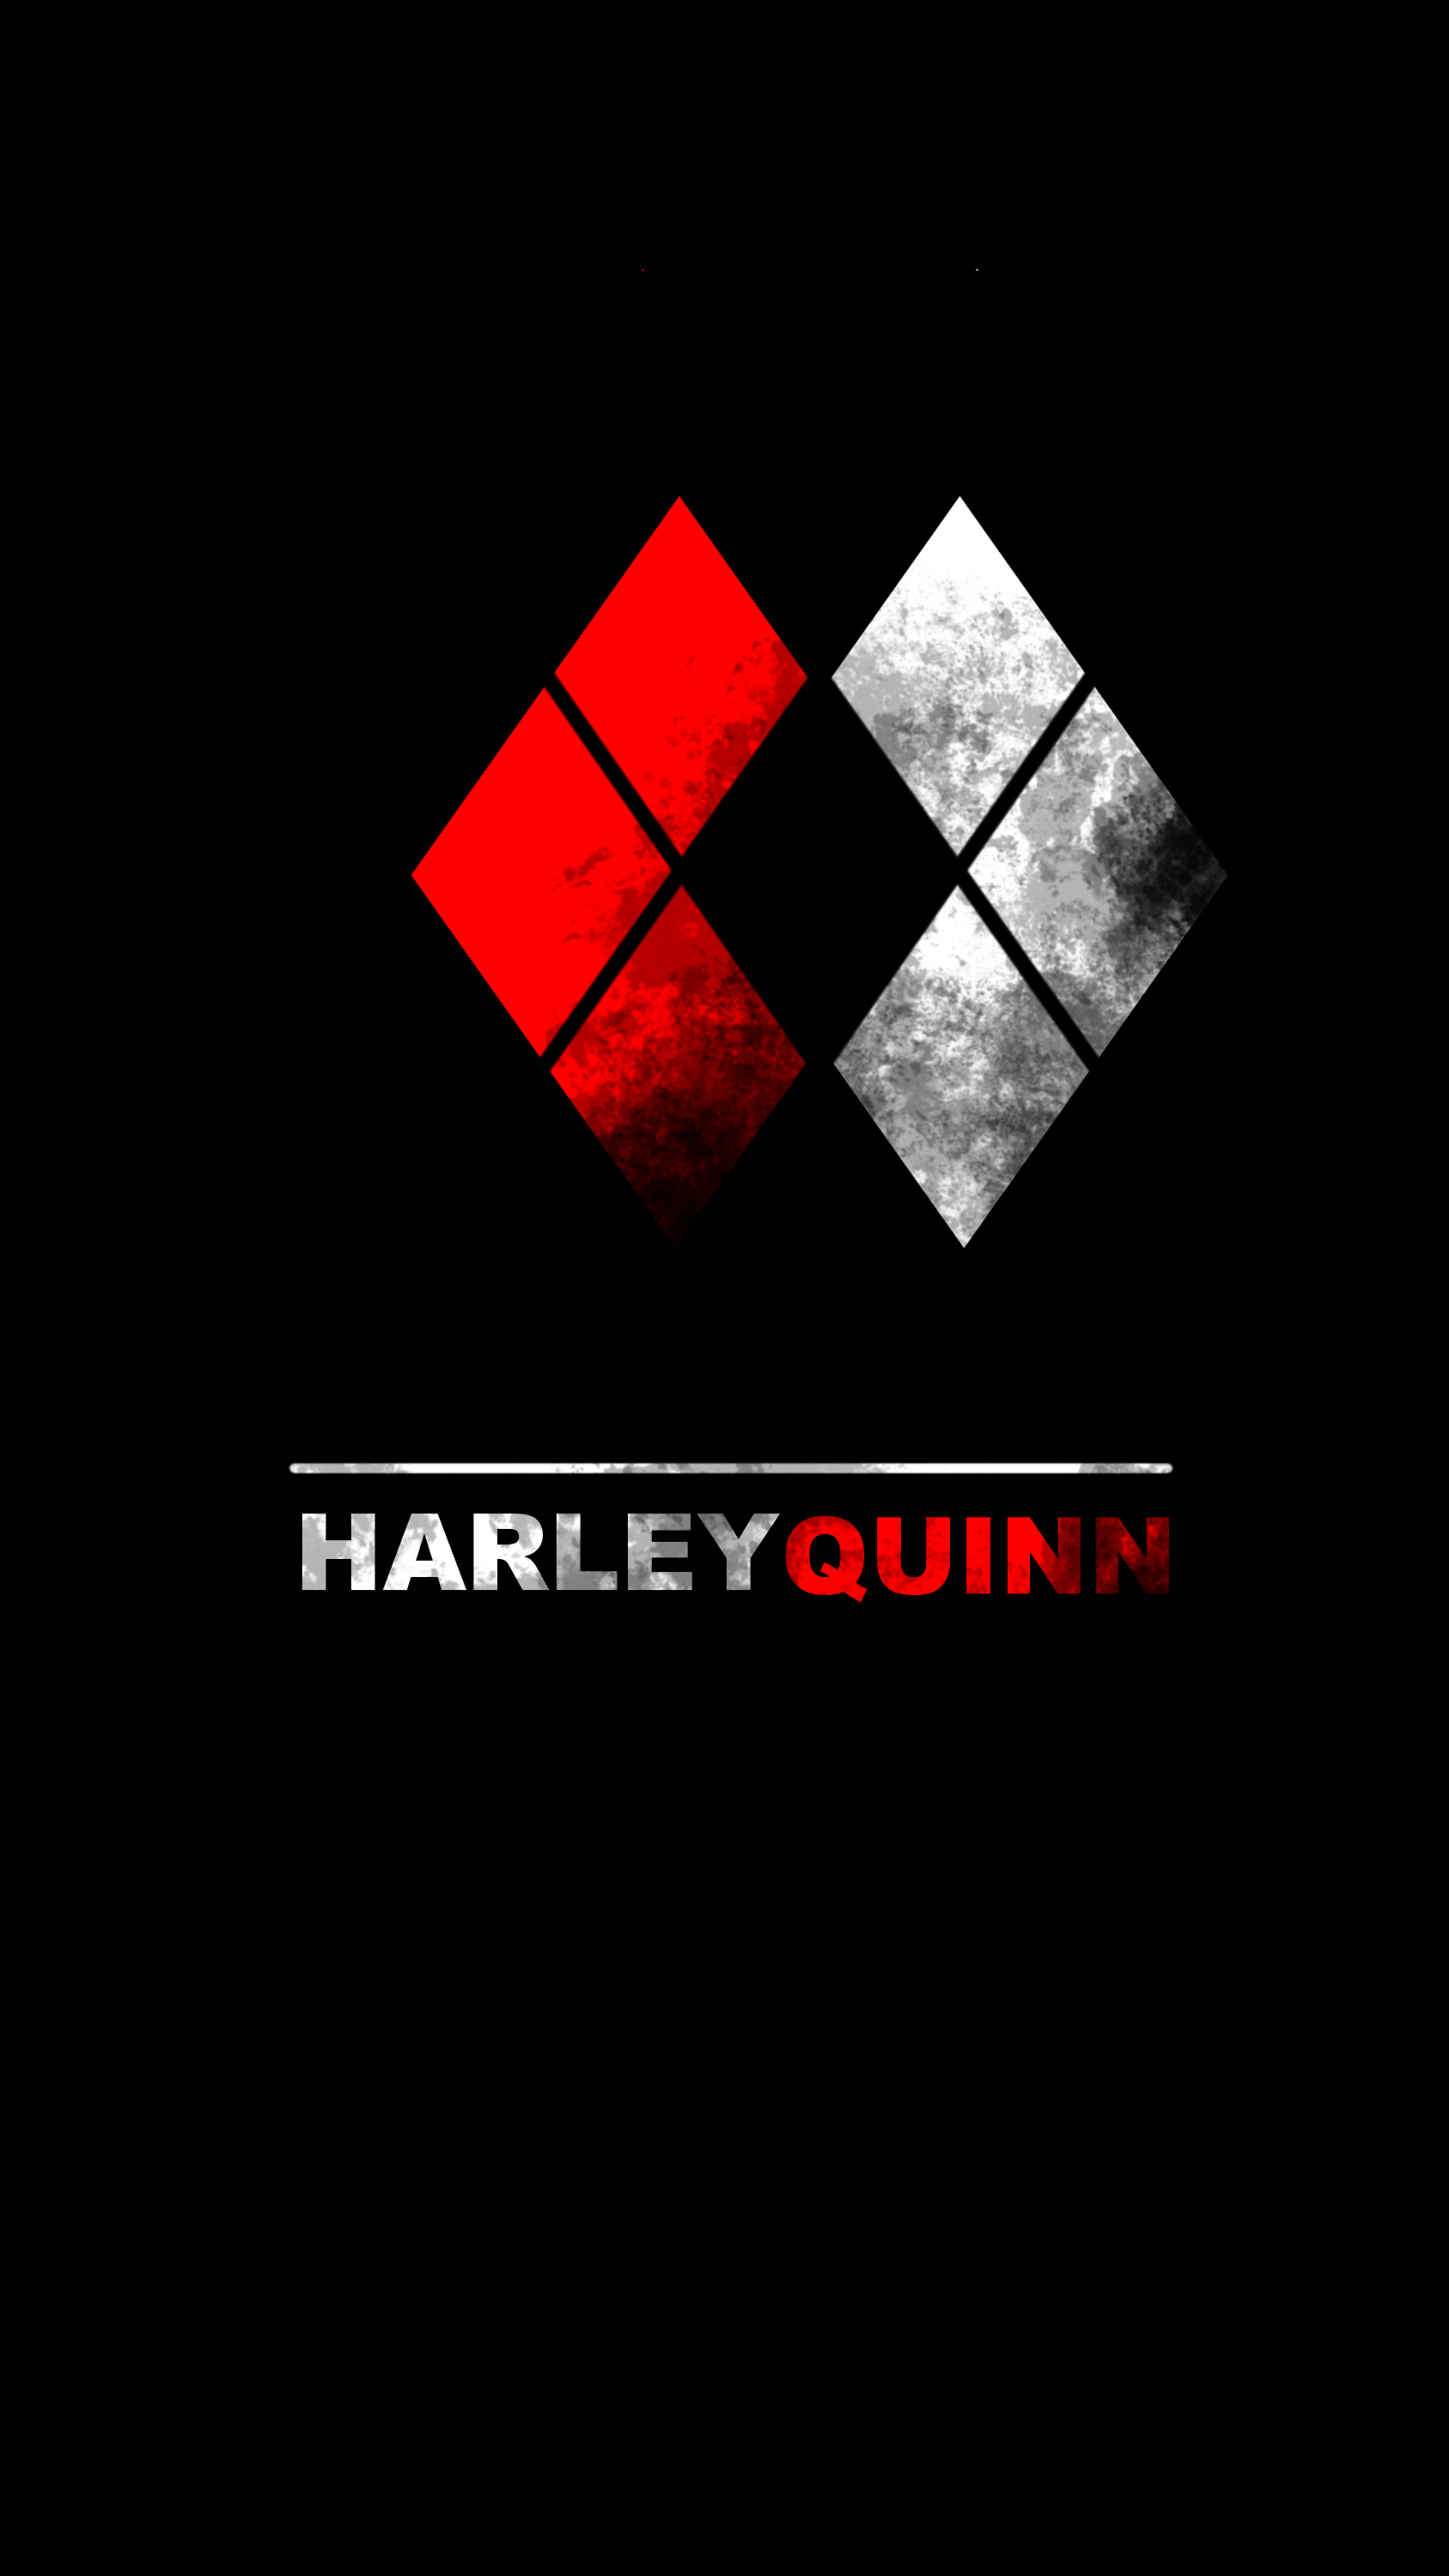 Harley Quinn Iphone 6 Wallpaper by KairoFall on DeviantArt